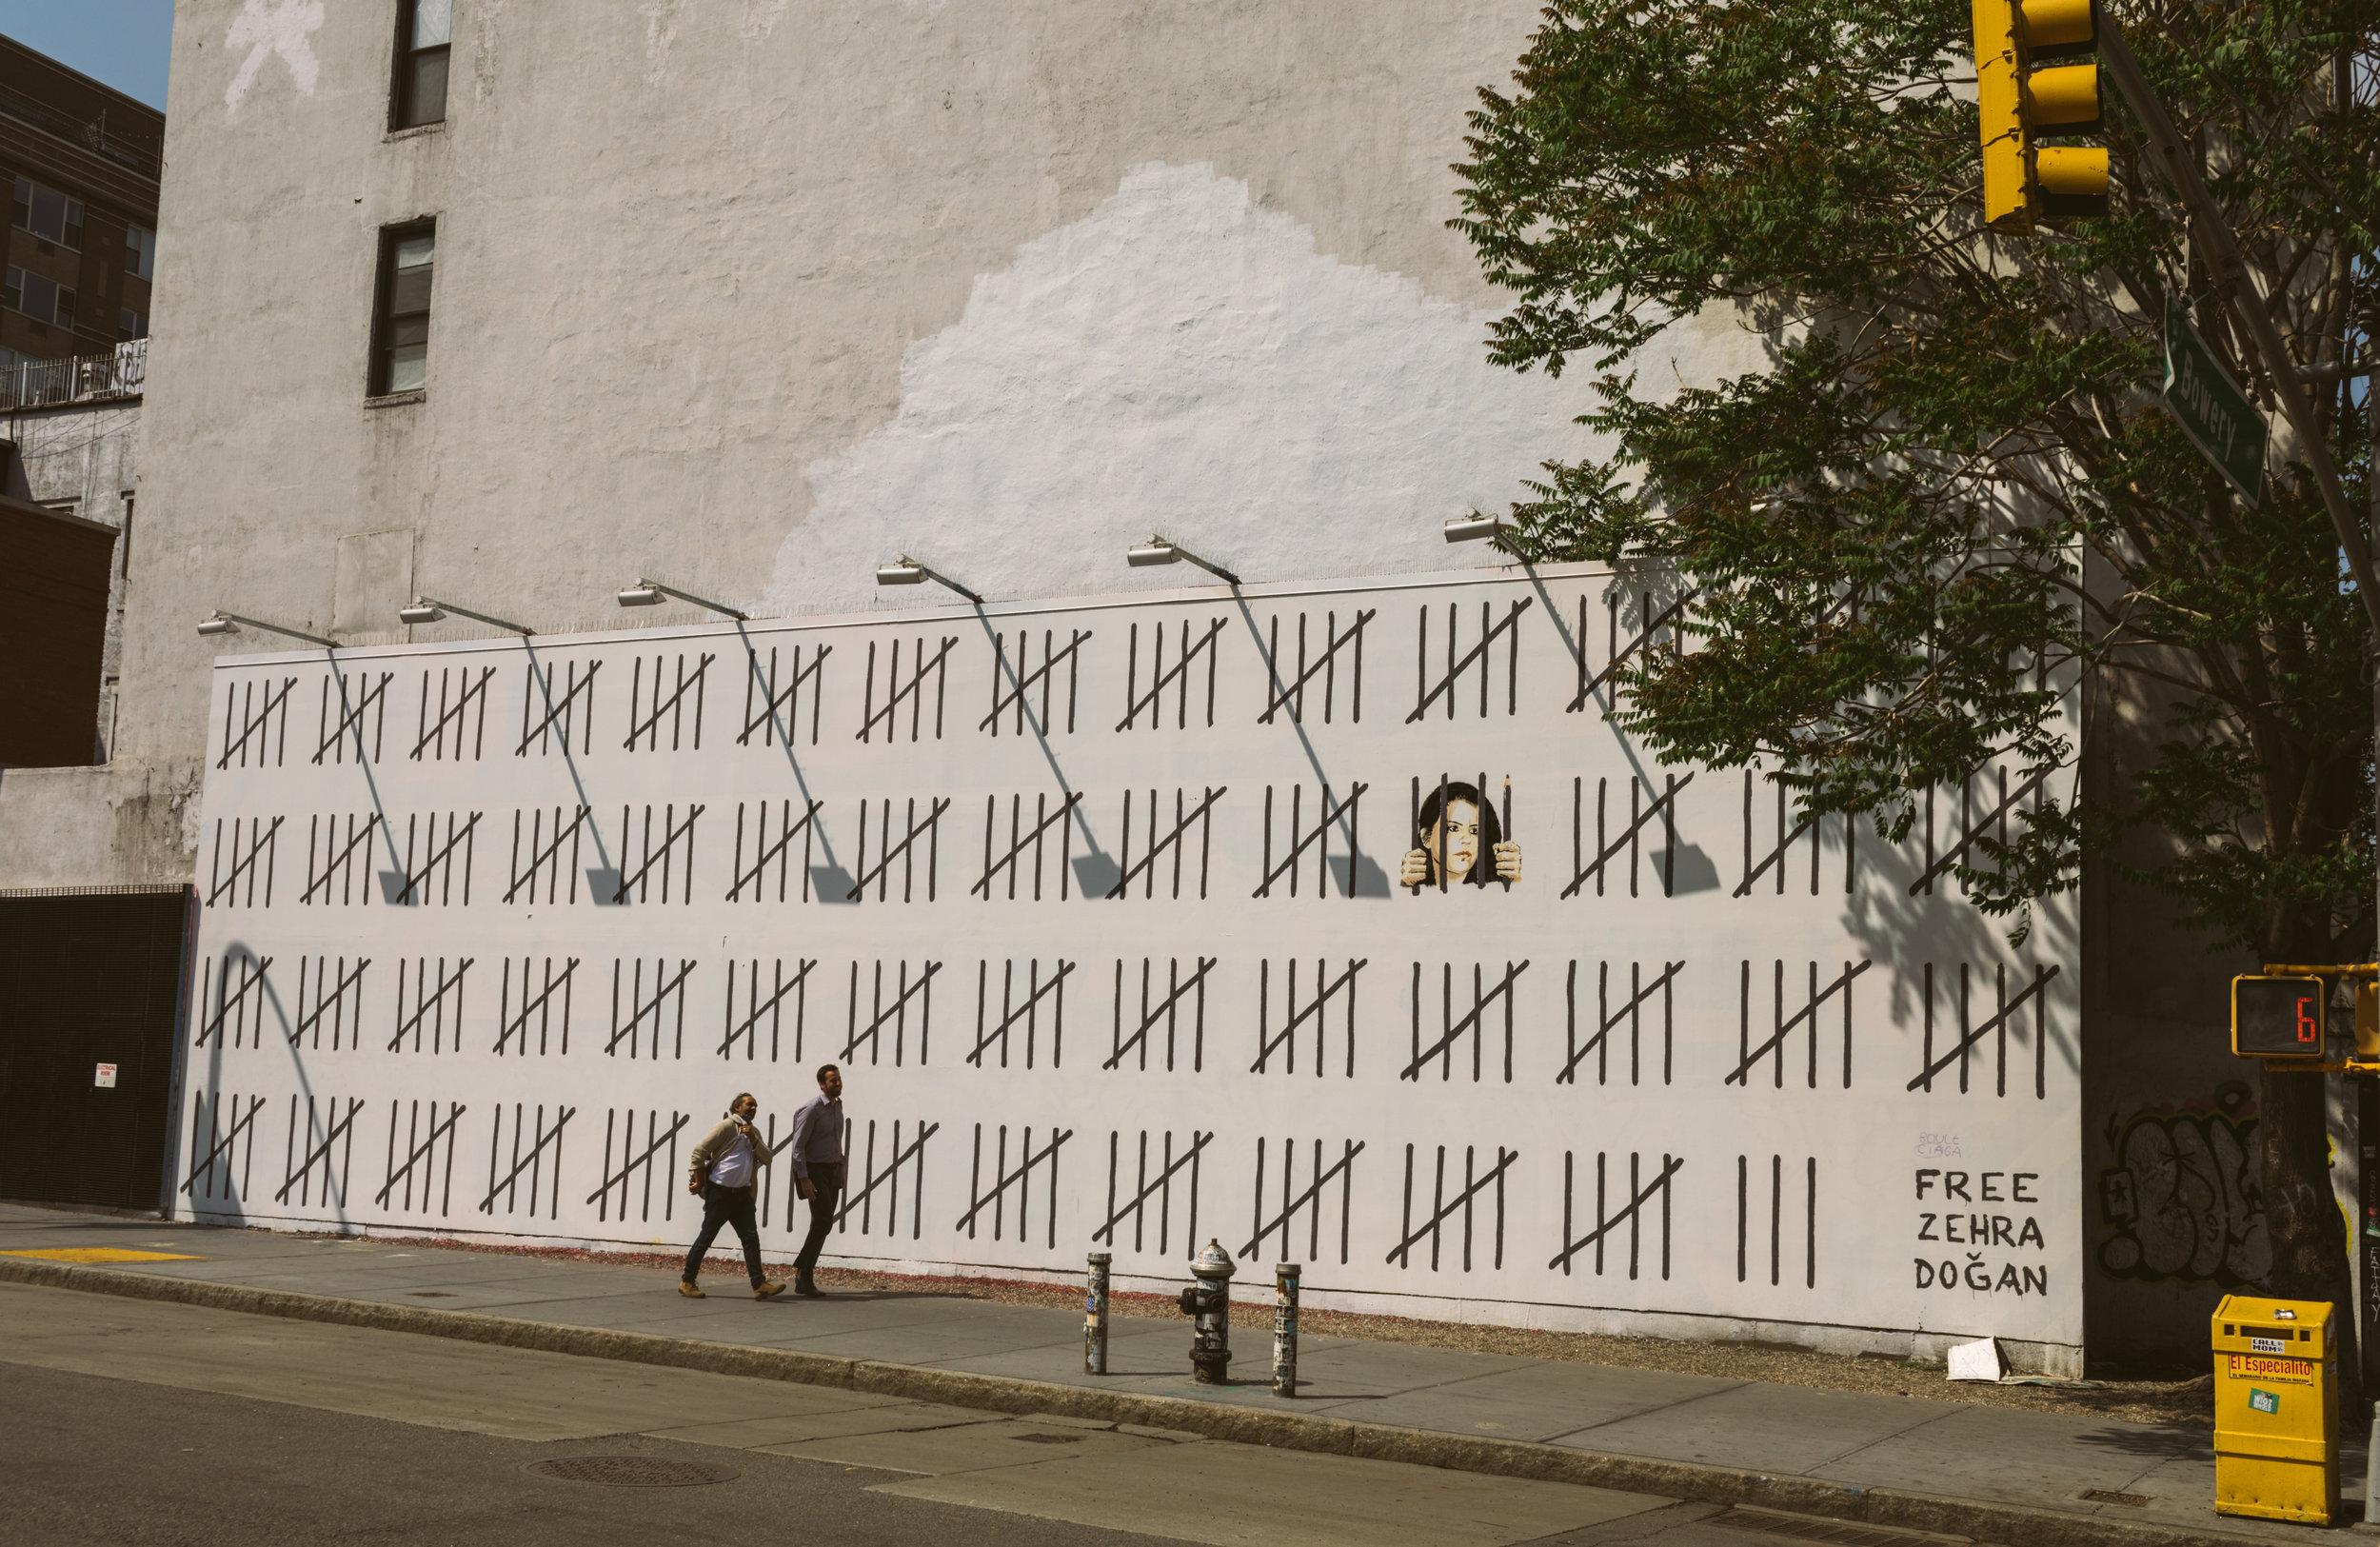 1020.shewanders.loves.new.york.art.museums.jpg